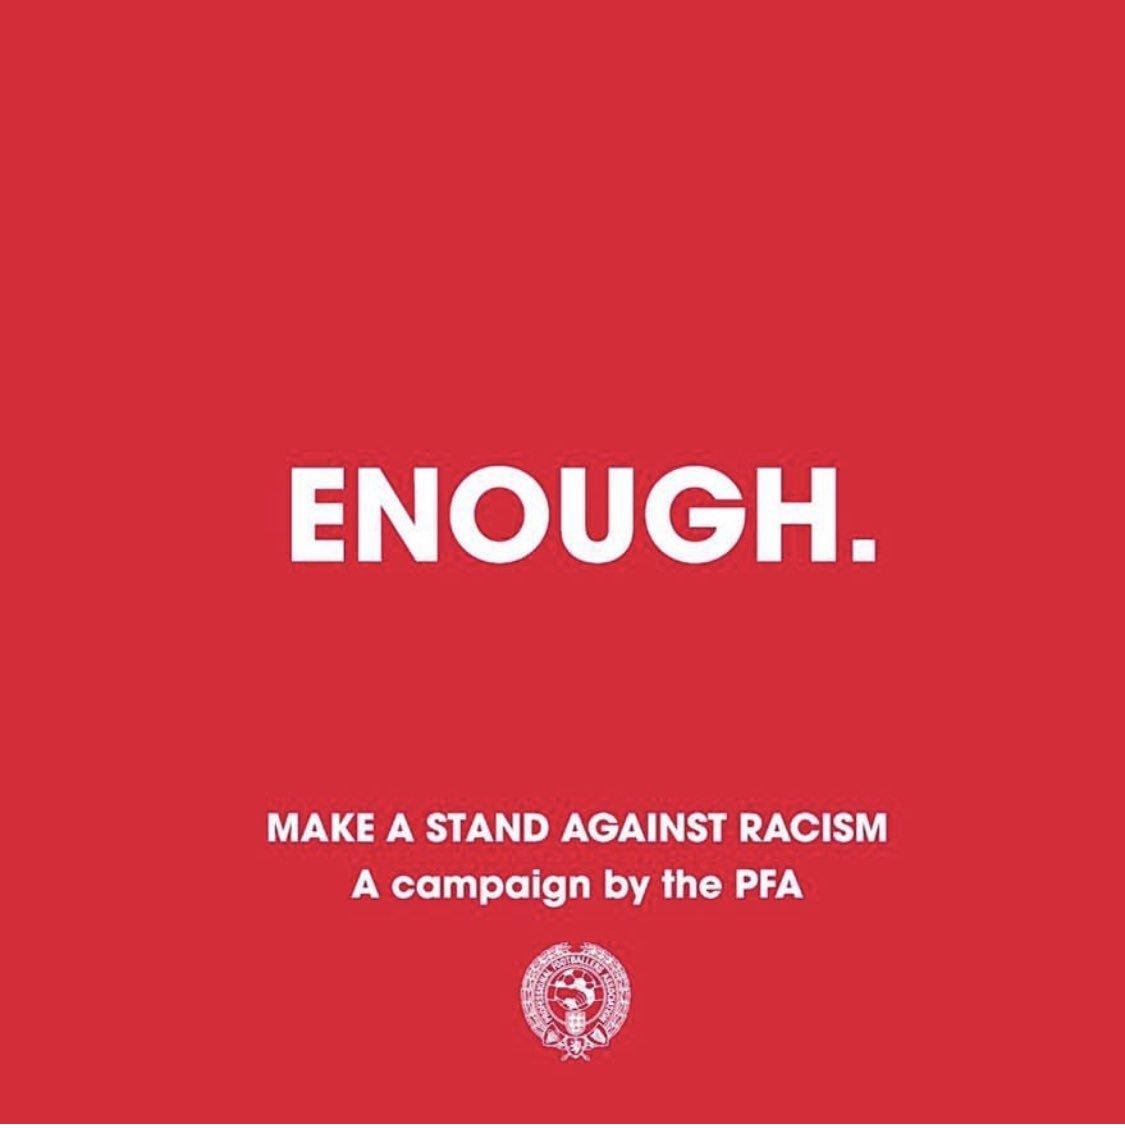 Footballers boycotting social media face 'racist abuse'